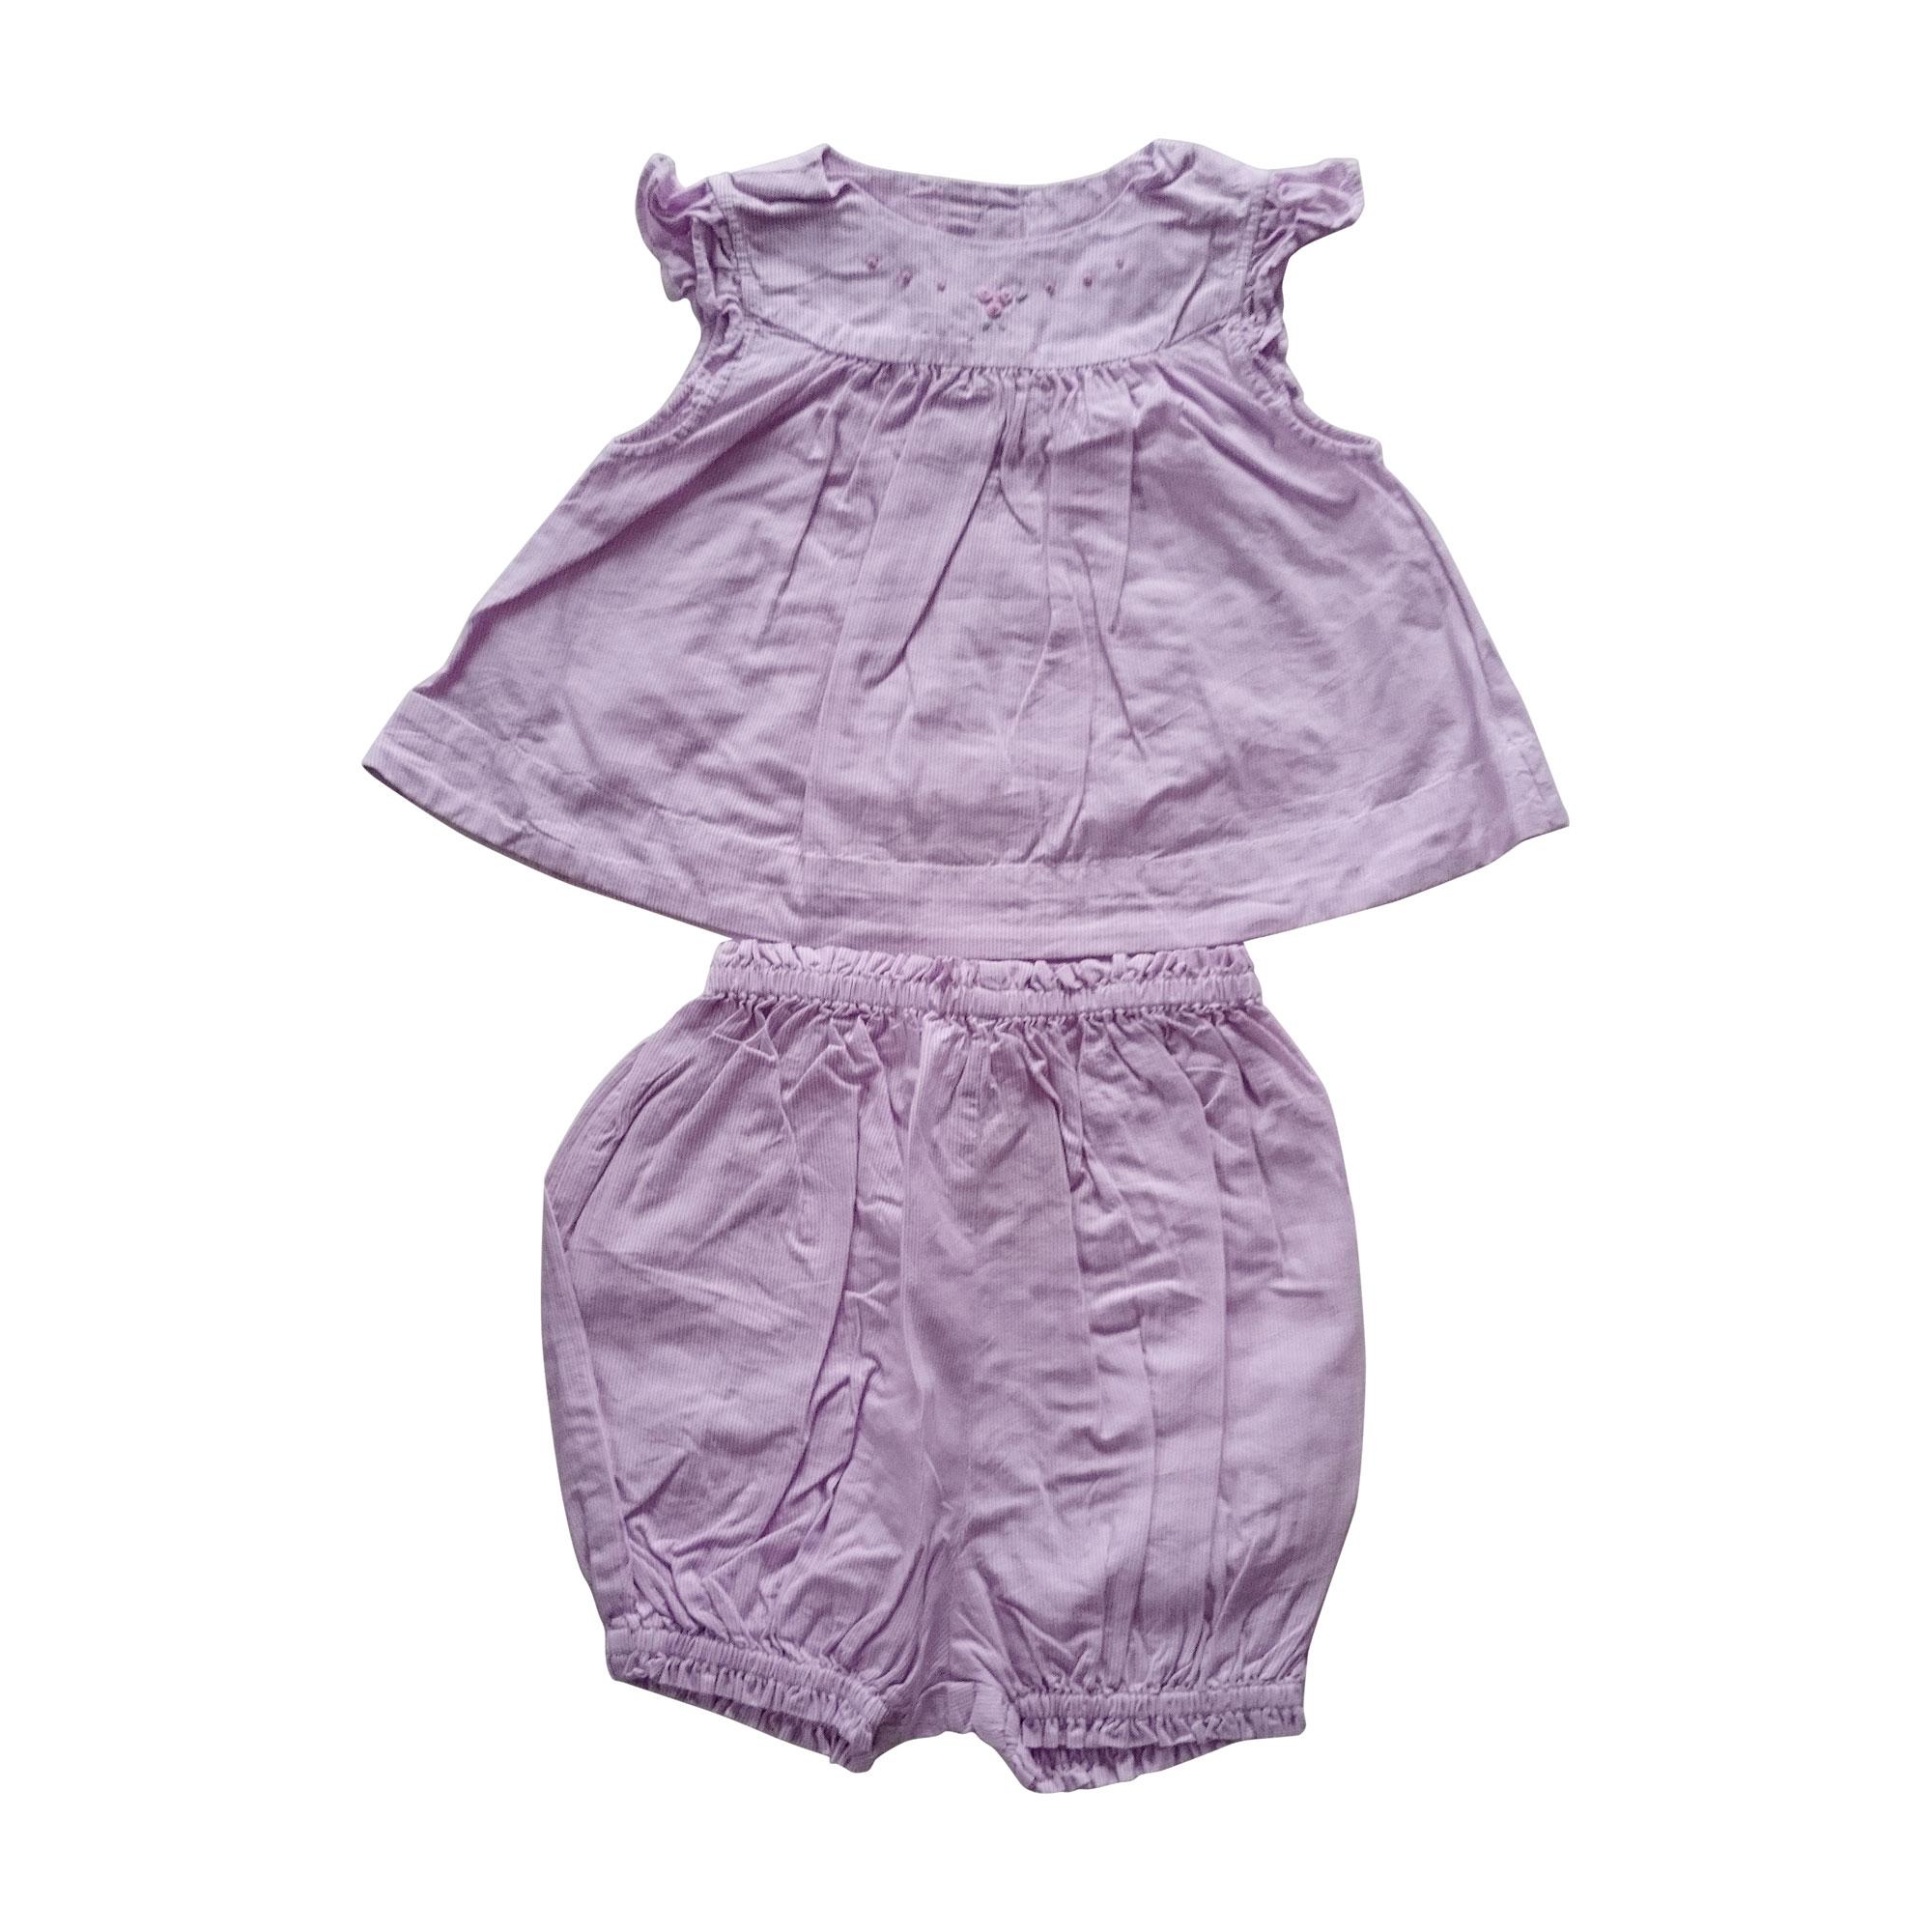 Ensemble & Combinaison pantalon JACADI Violet, mauve, lavande